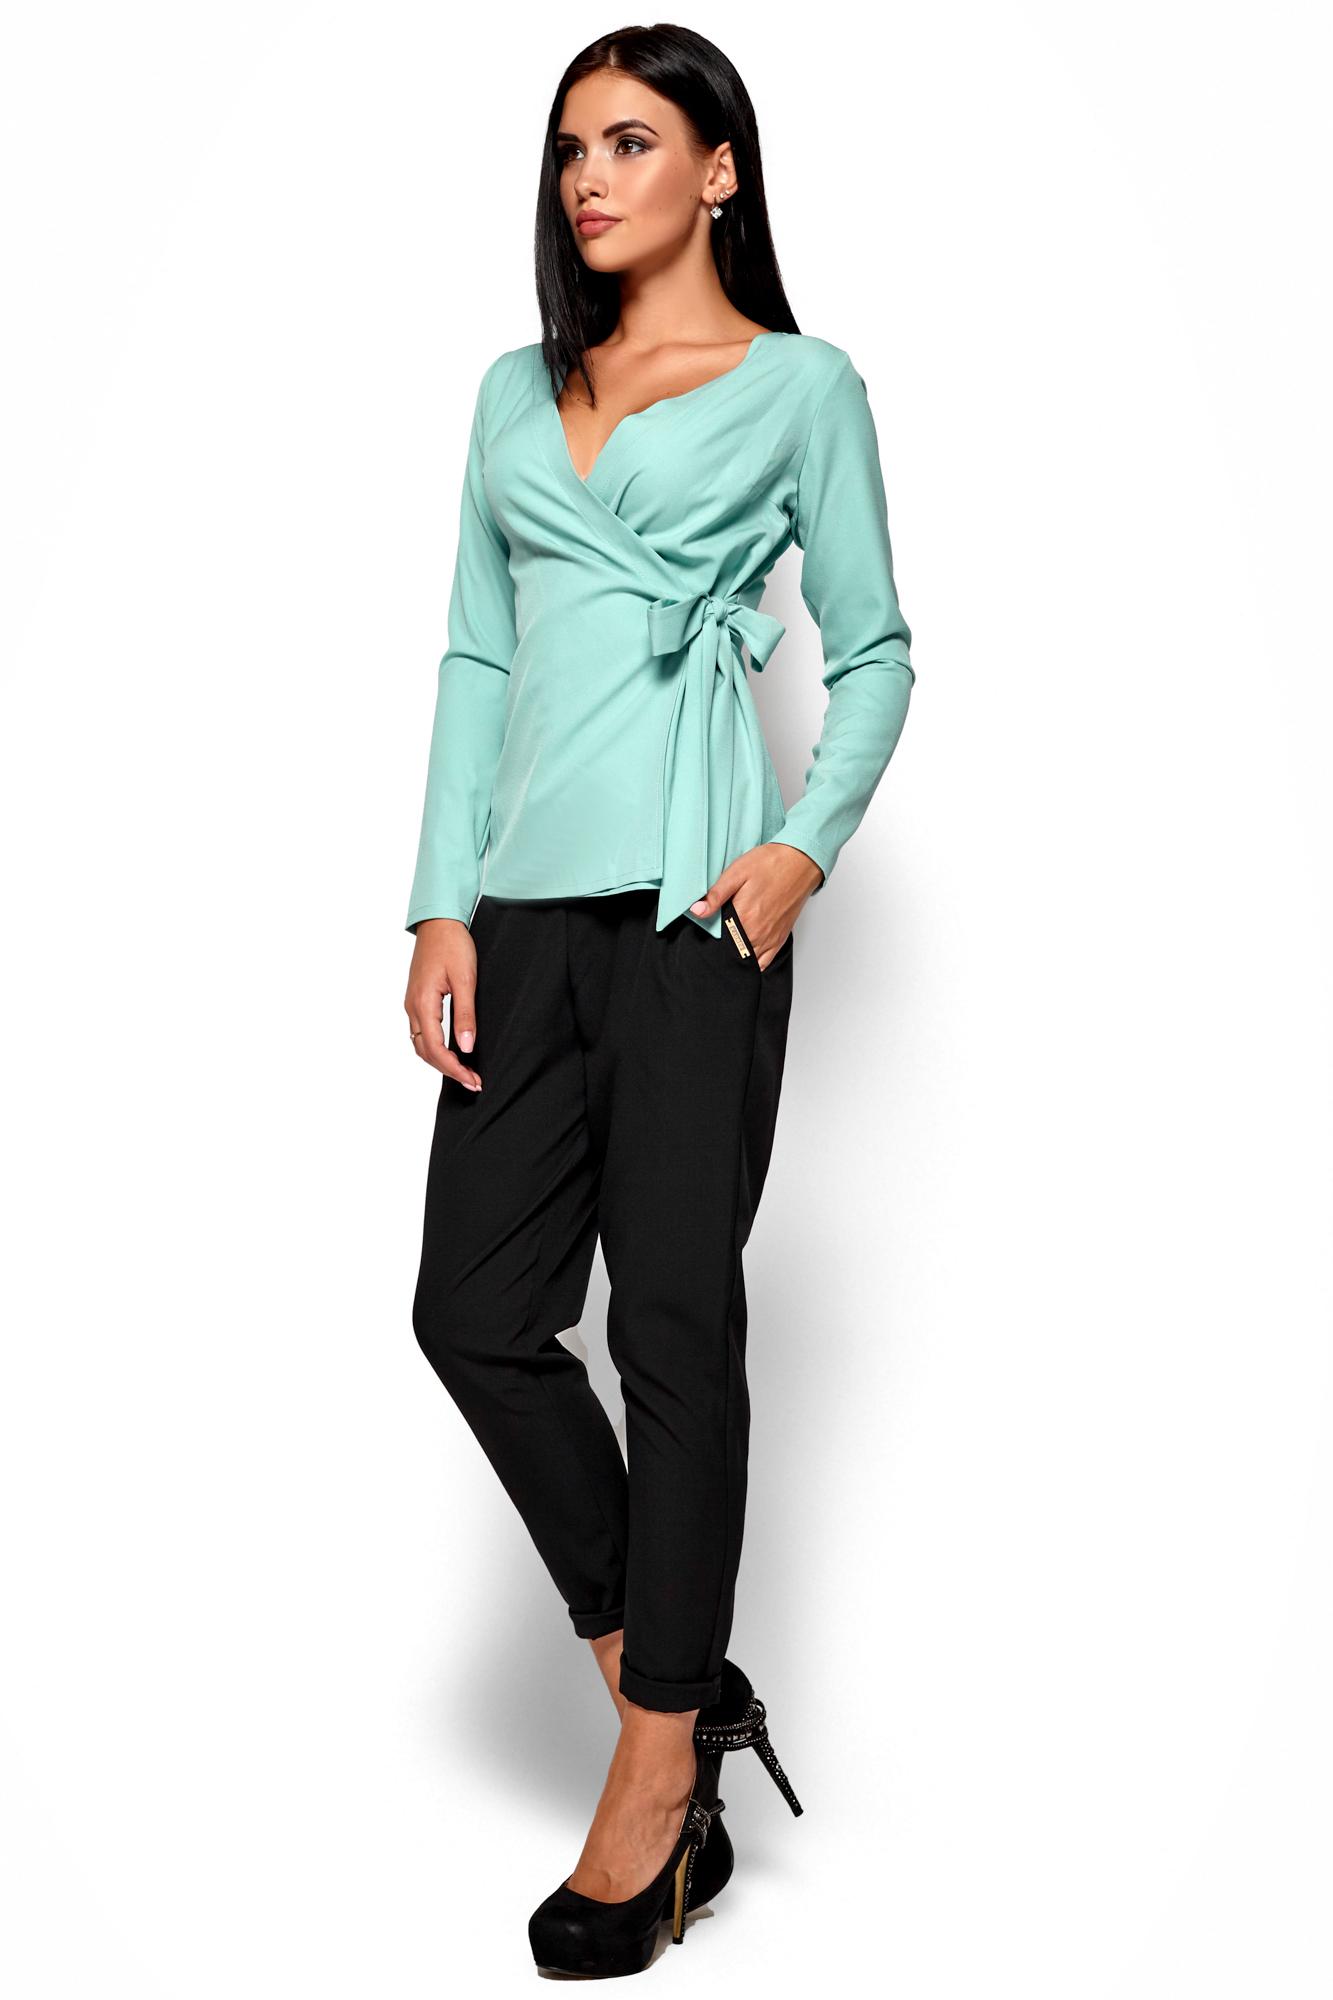 dc02018fa86 Купить Блуза Сабрина Karree